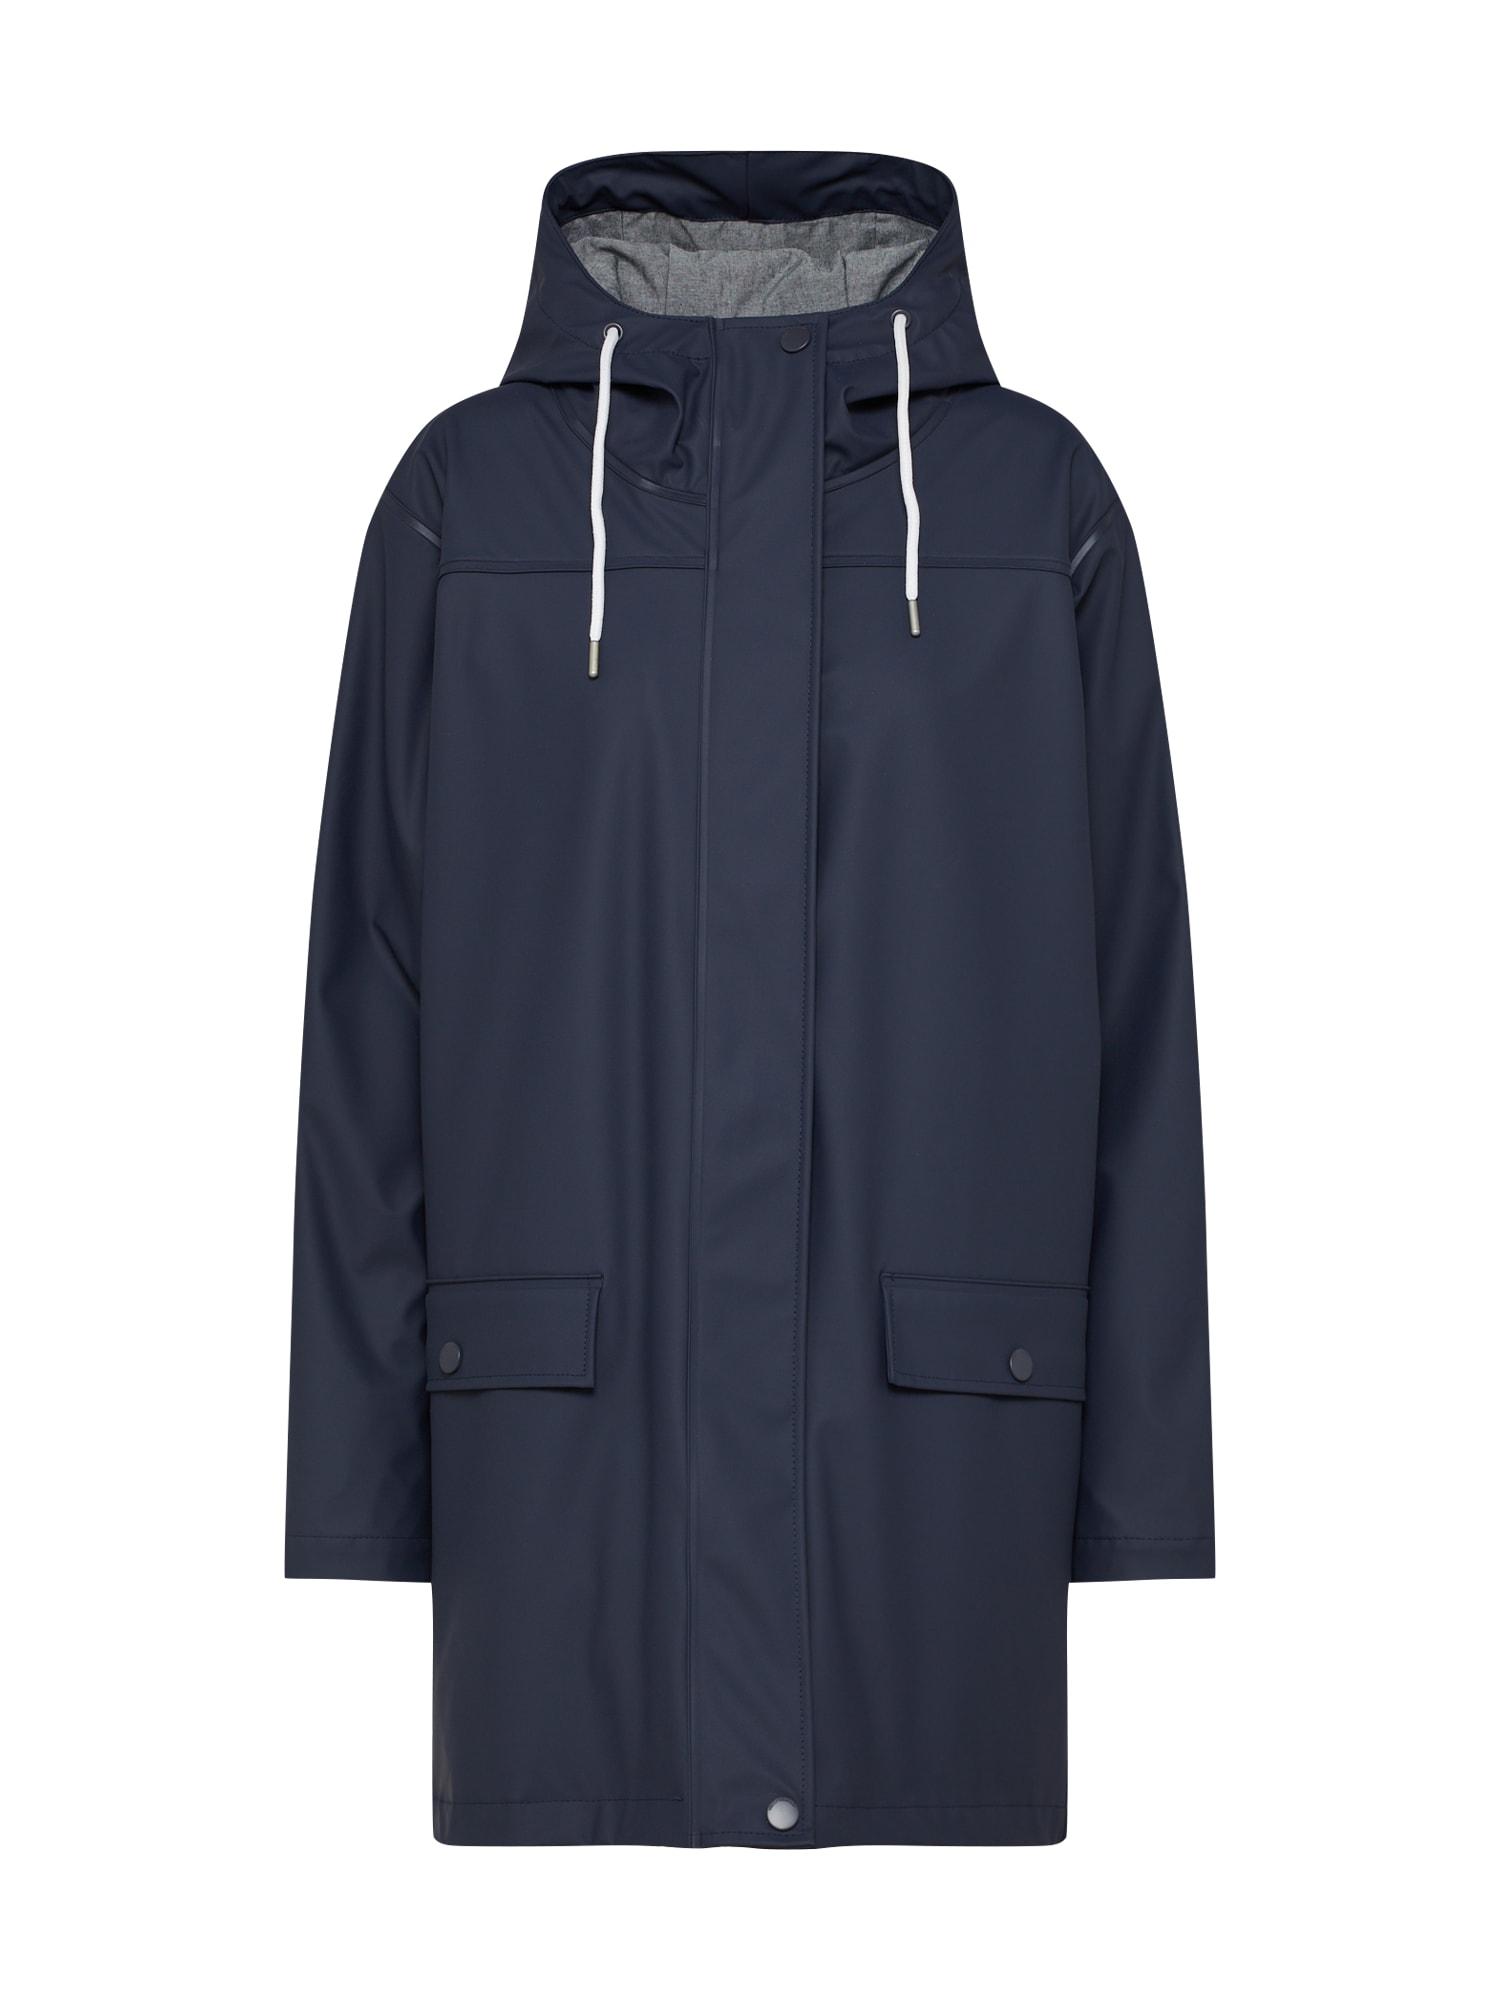 Přechodná bunda tmavě modrá HELLY HANSEN